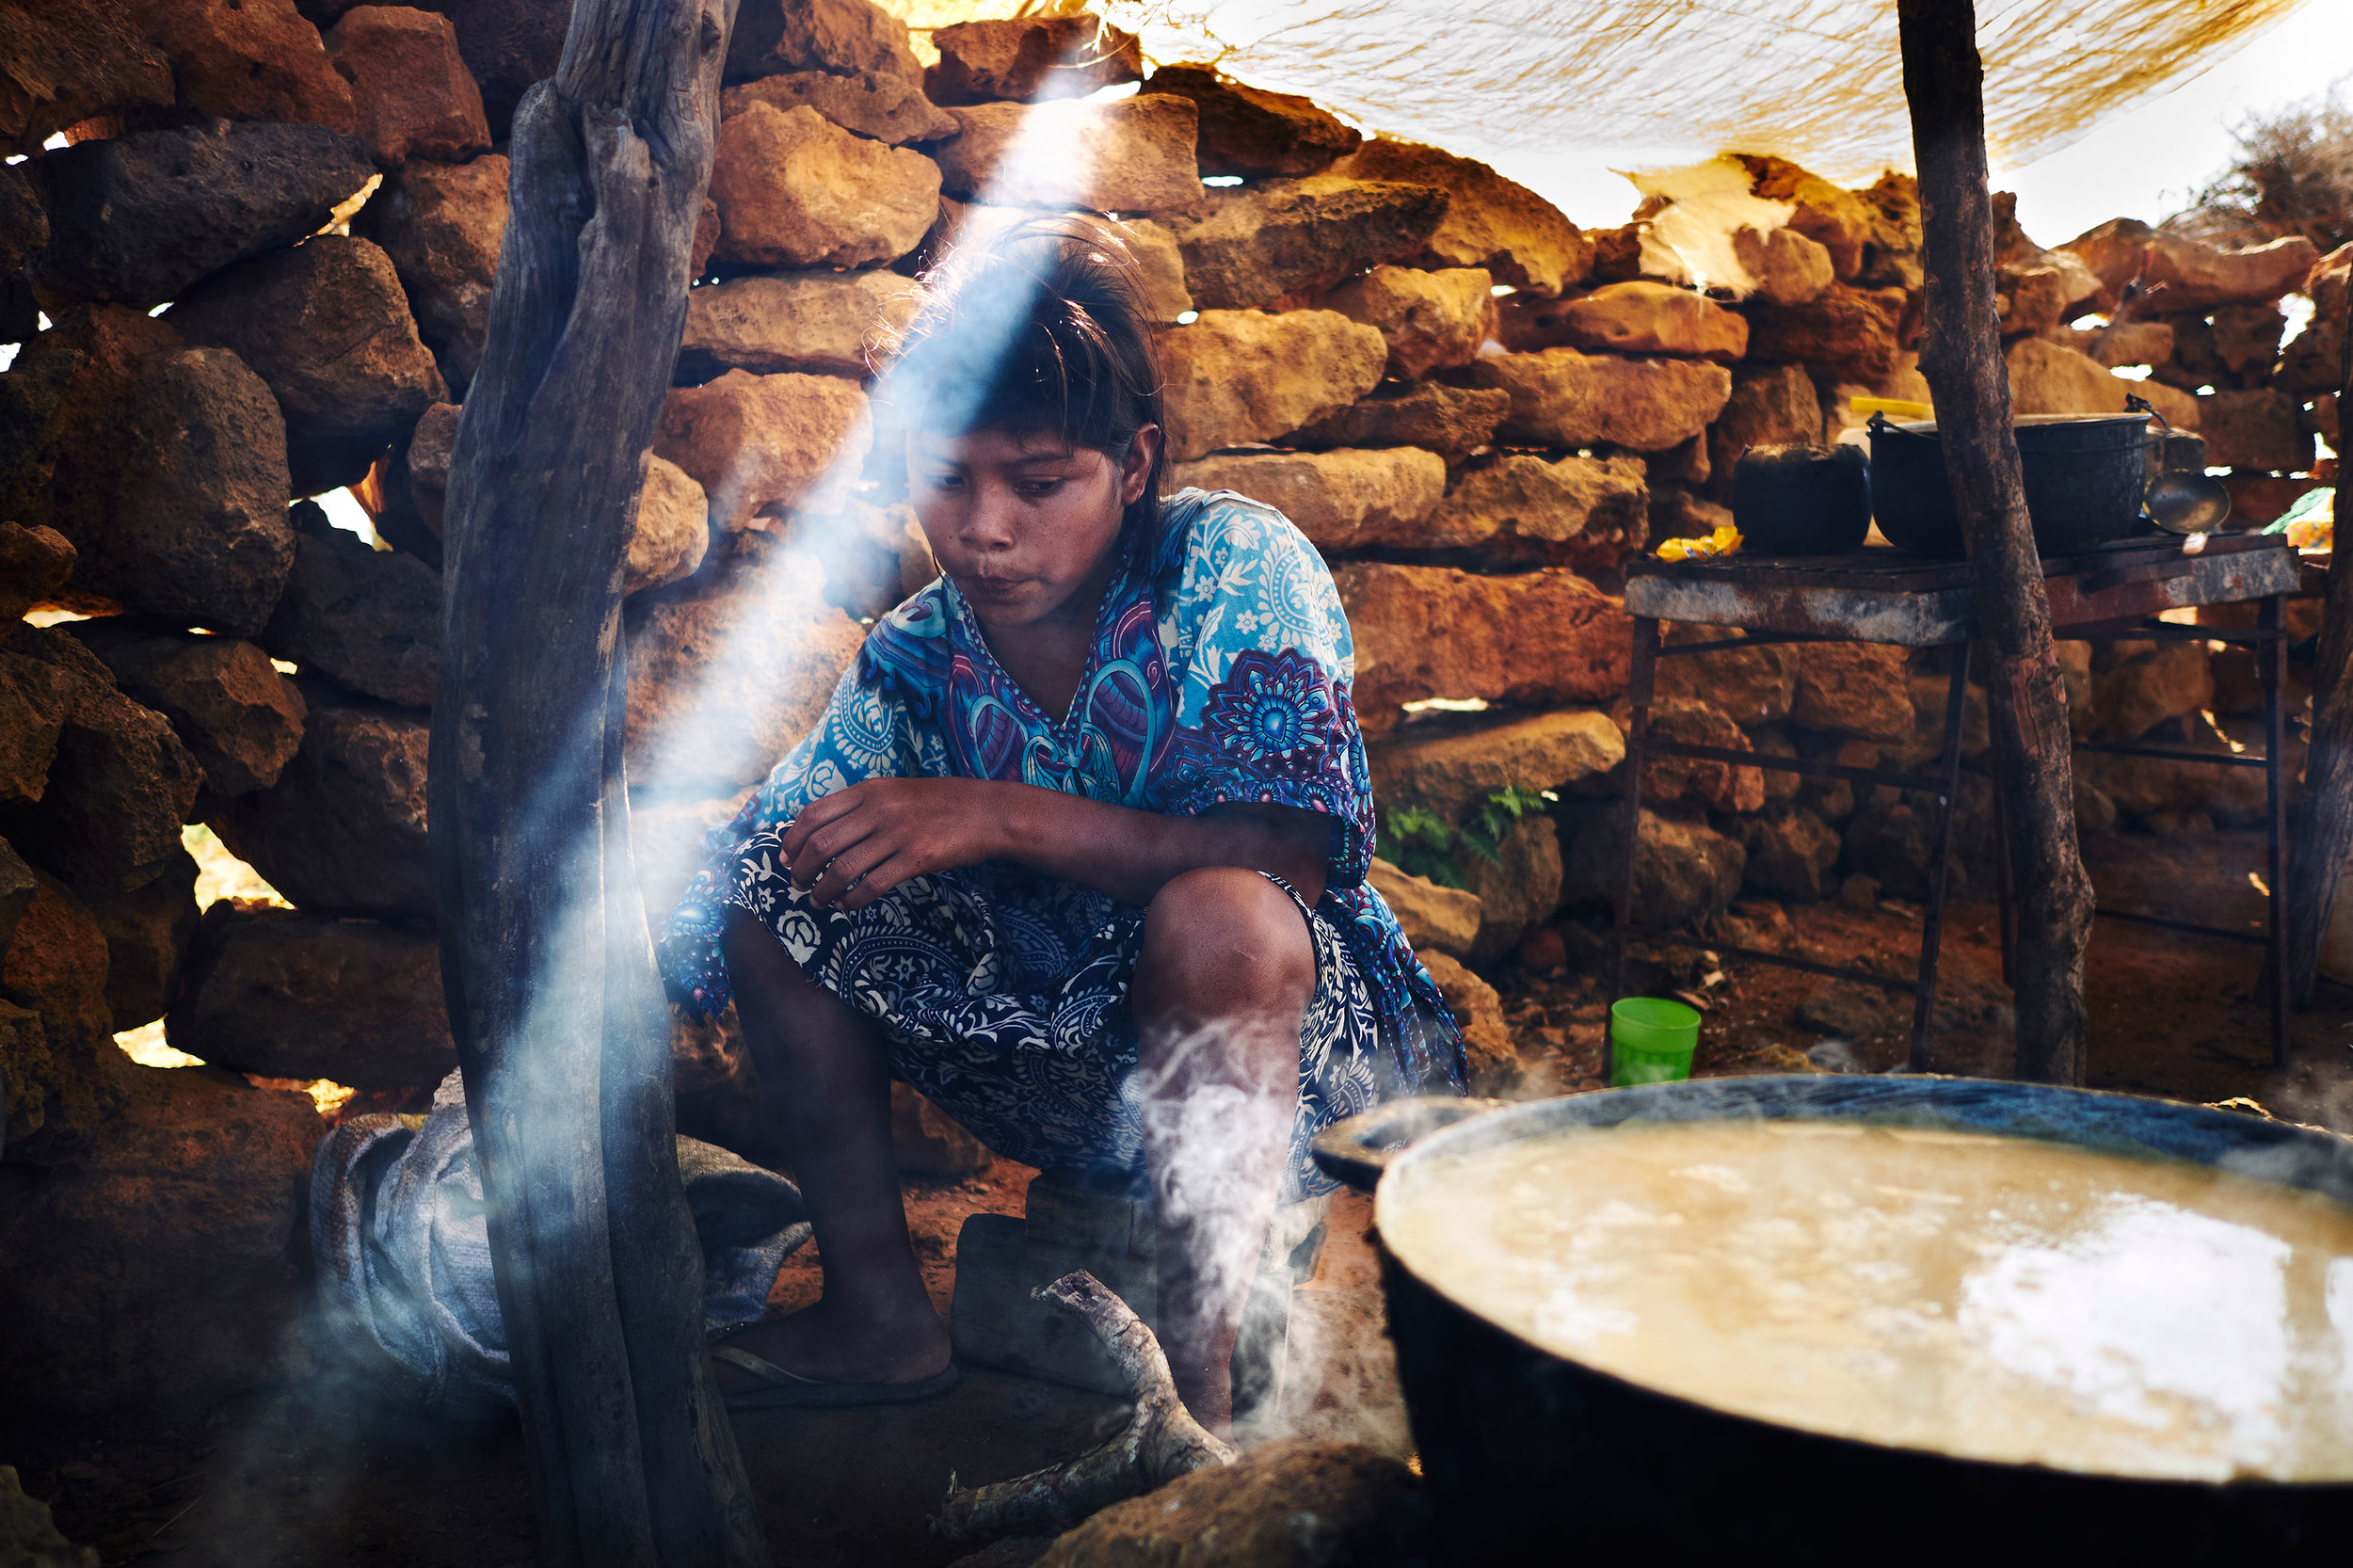 Colombia-La-Punta-Gallina-Wayuu-girl-cooking-fish